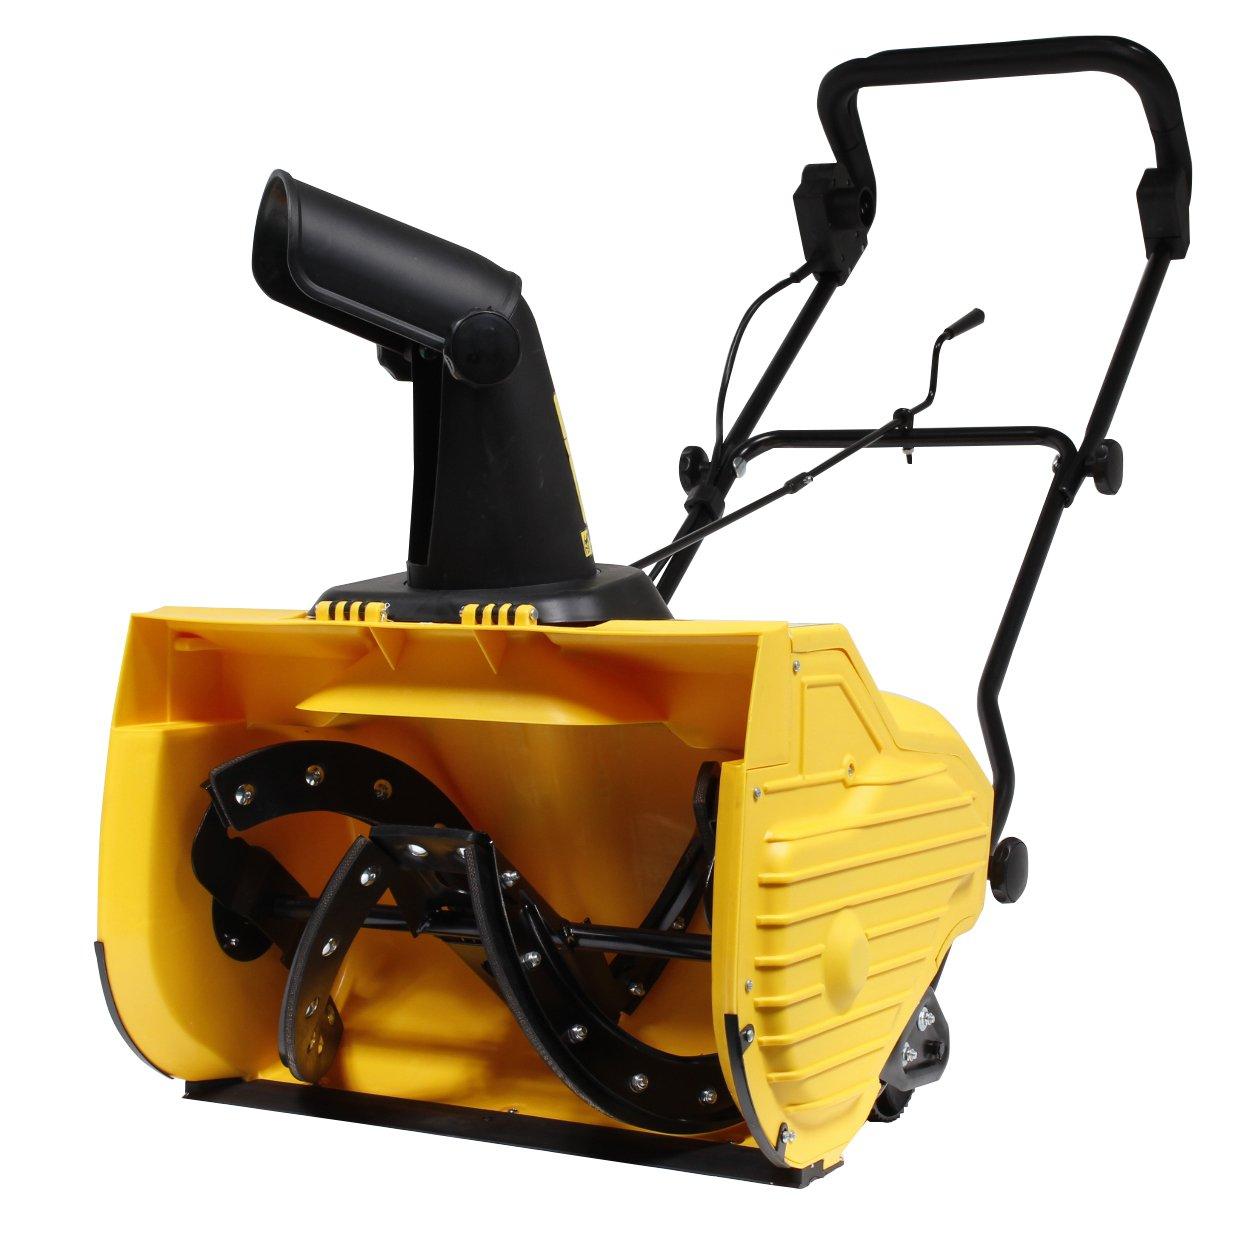 HAIGE [1年保証] 電動 除雪機 HG-K1650 除雪幅50cm 1600Wモーター搭載